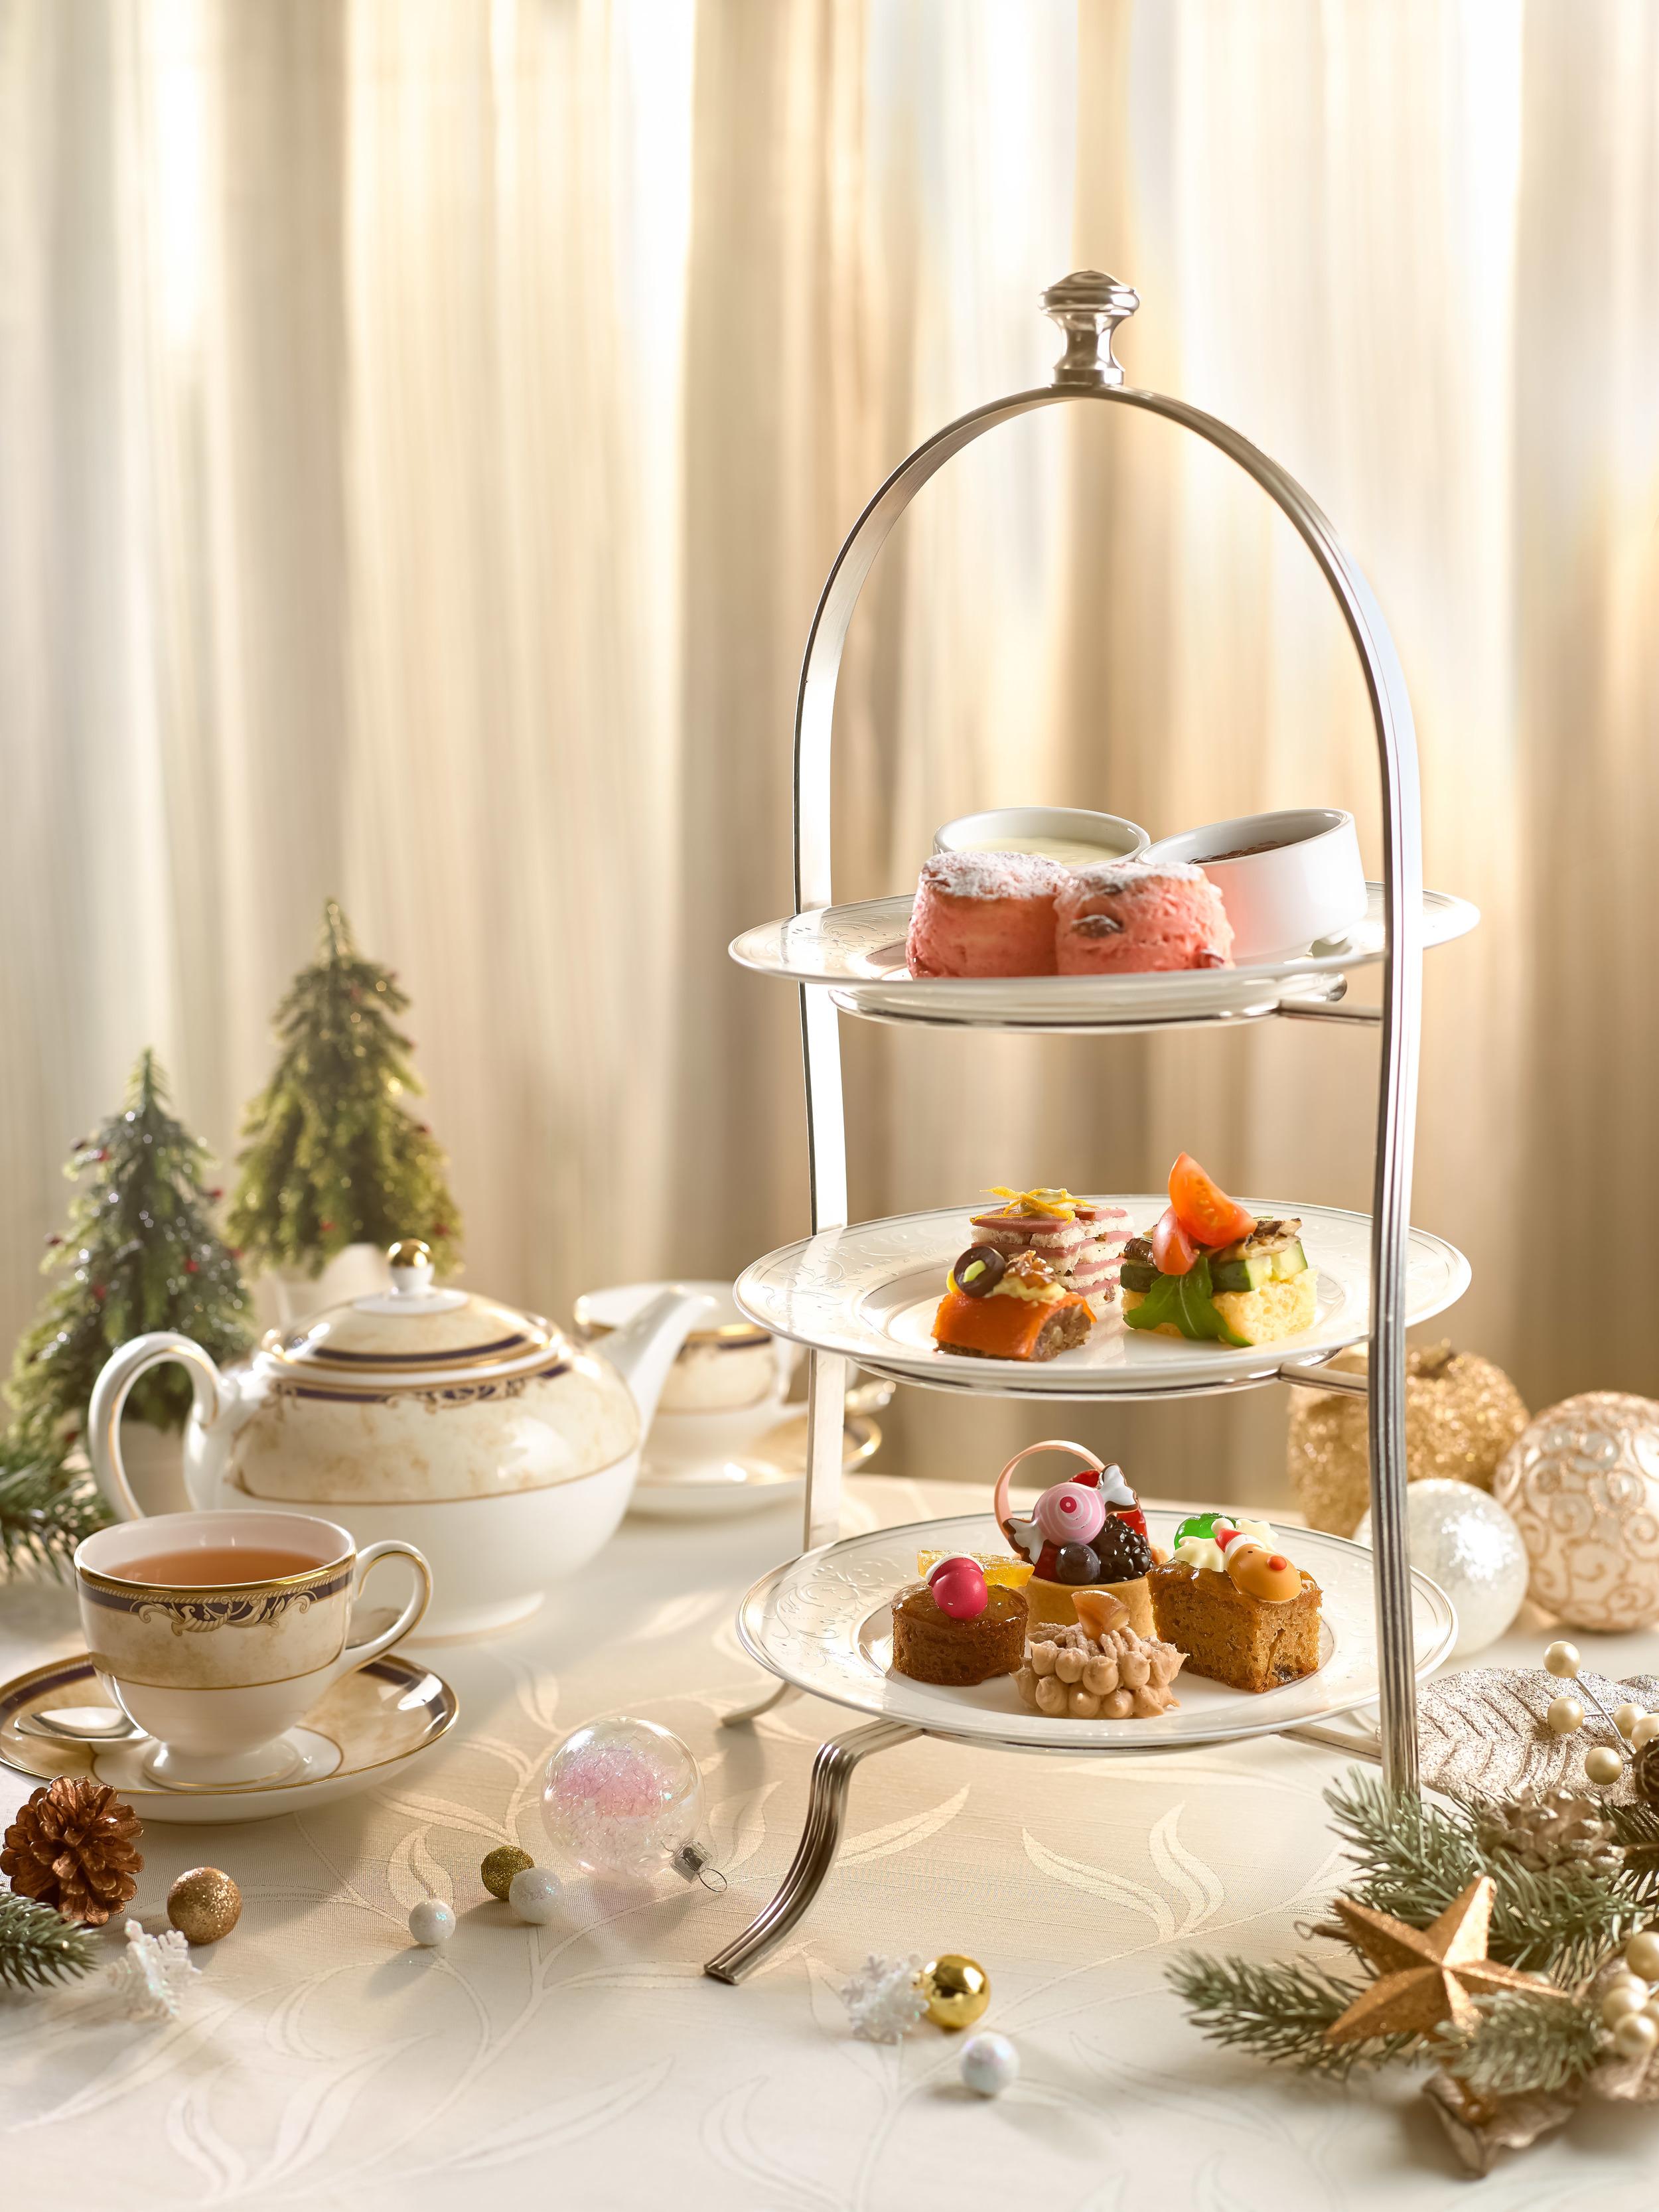 Afternoon Tea at Lobby Court | Photo Credit: Shangri-La Hotel, Singapore